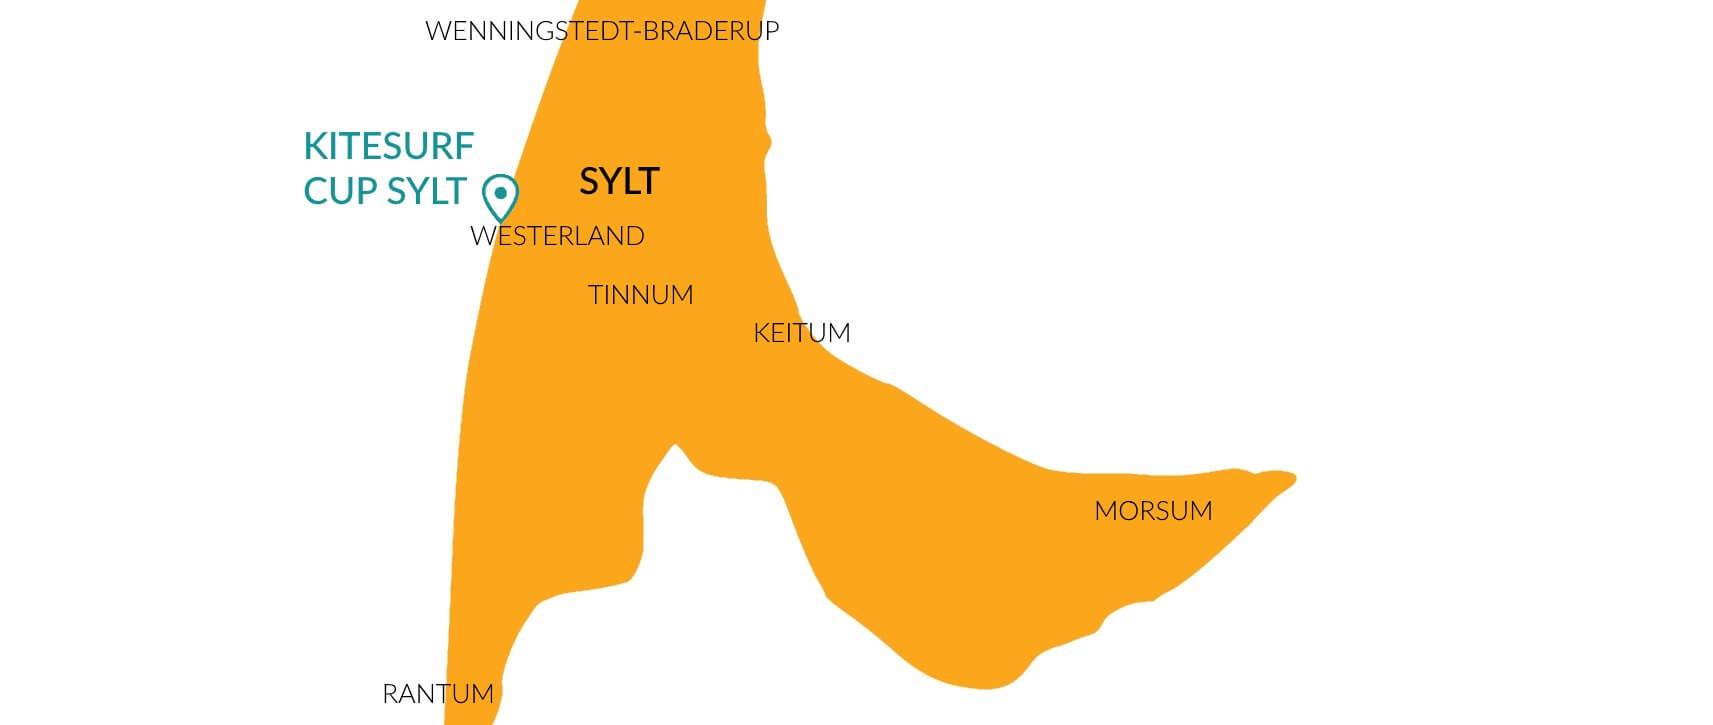 Kitesurf Cup Sylt 2018 Karte